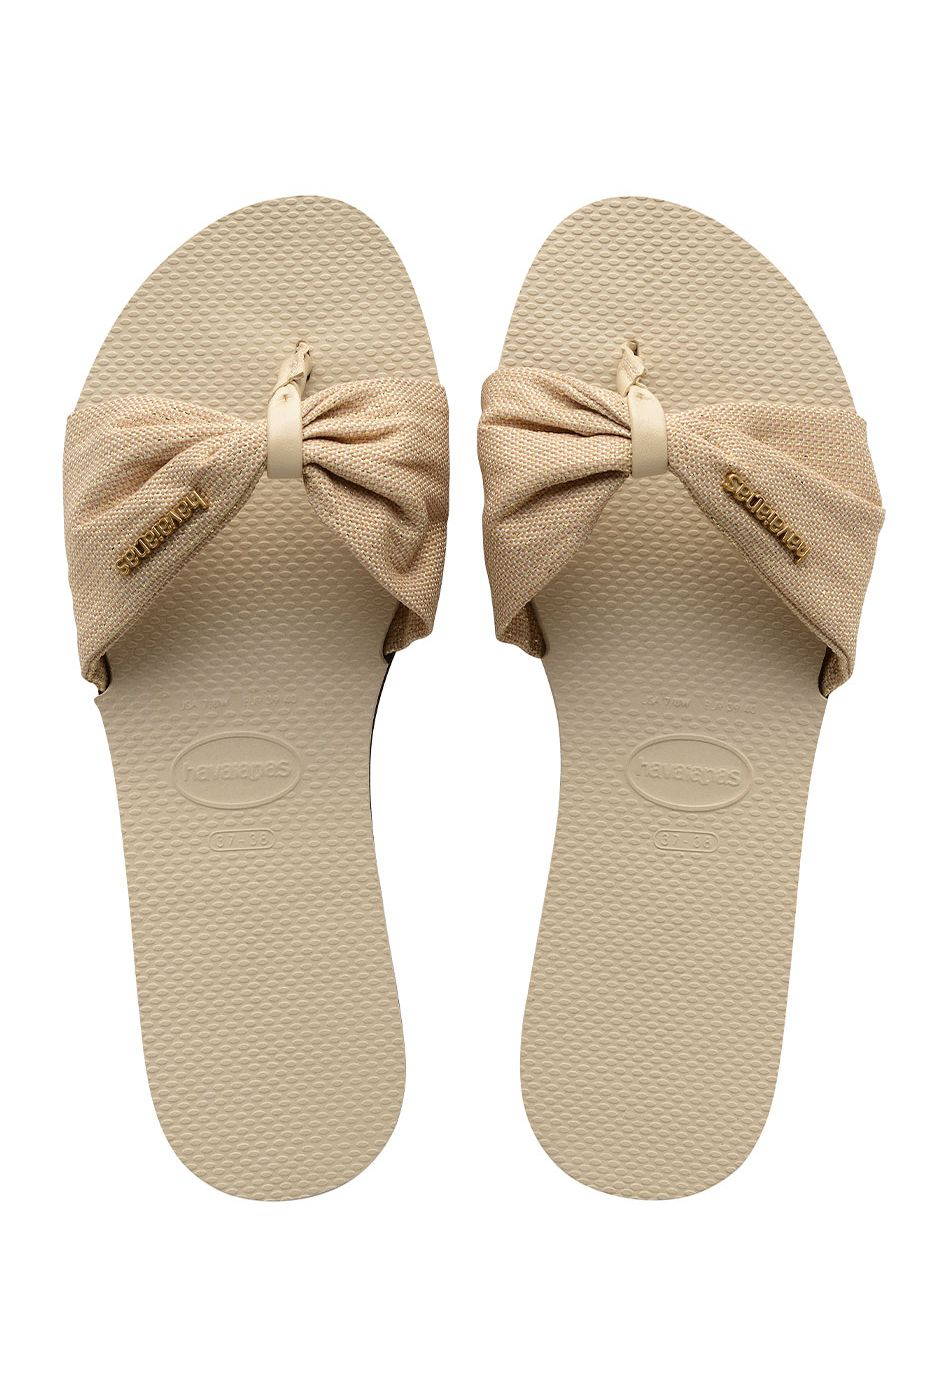 Havaianas Sandals YOU ST TROPEZ SHINE Beige